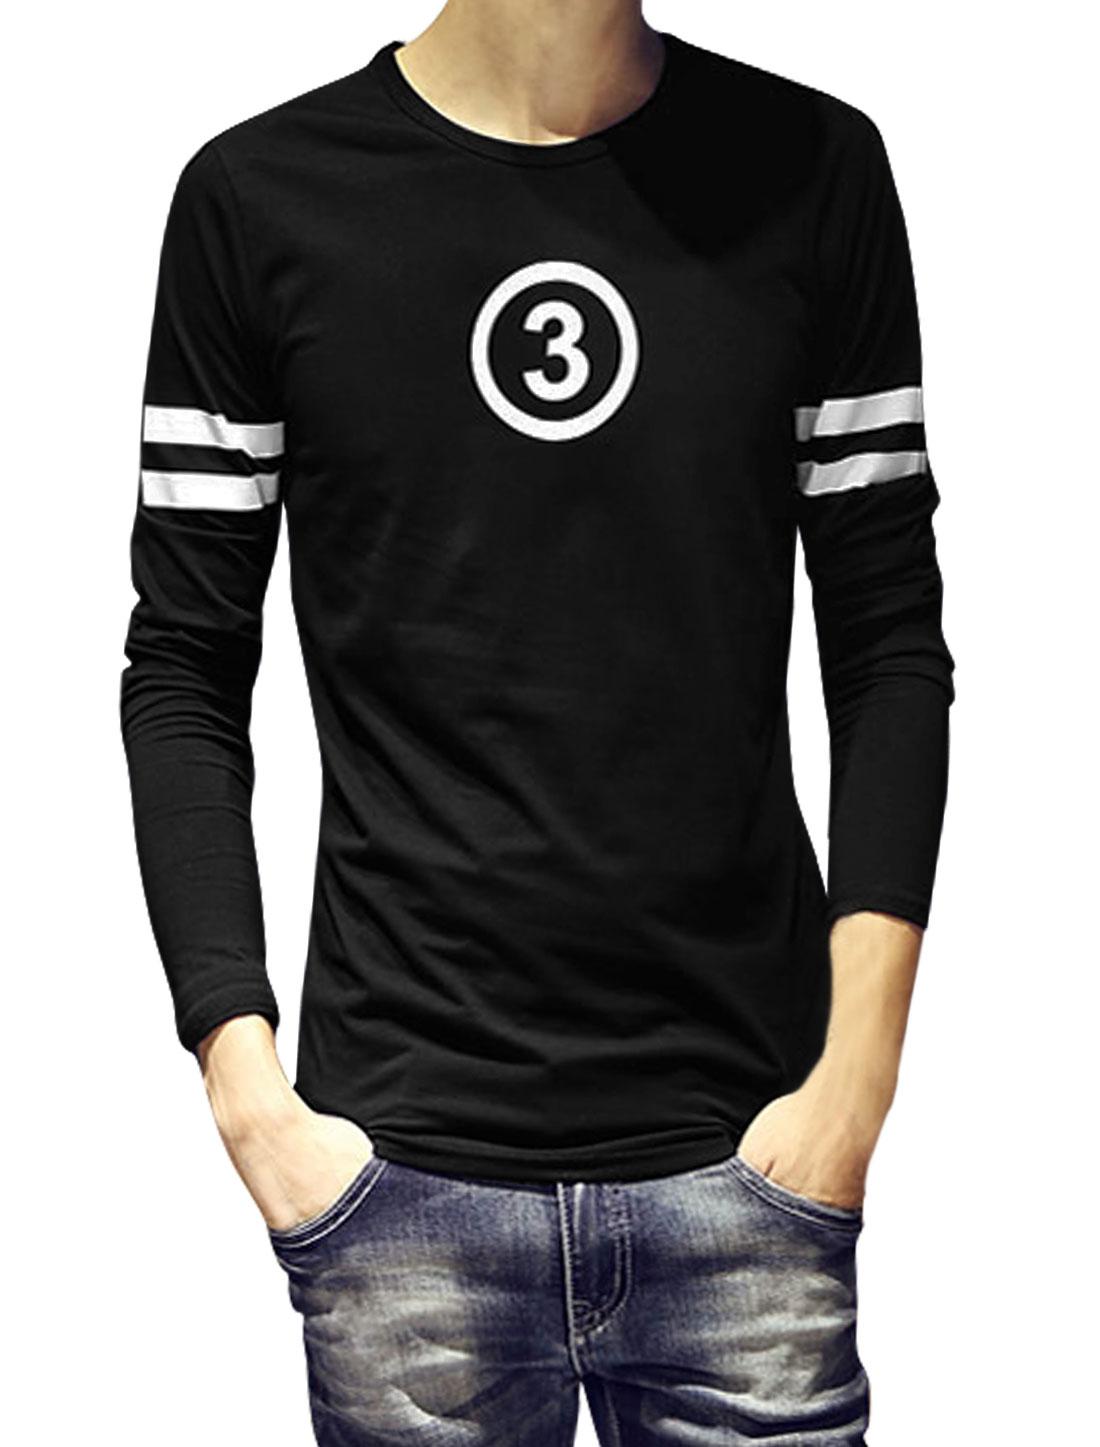 Men Long Sleeve Slipover Number Printed Casual T-Shirt Black M